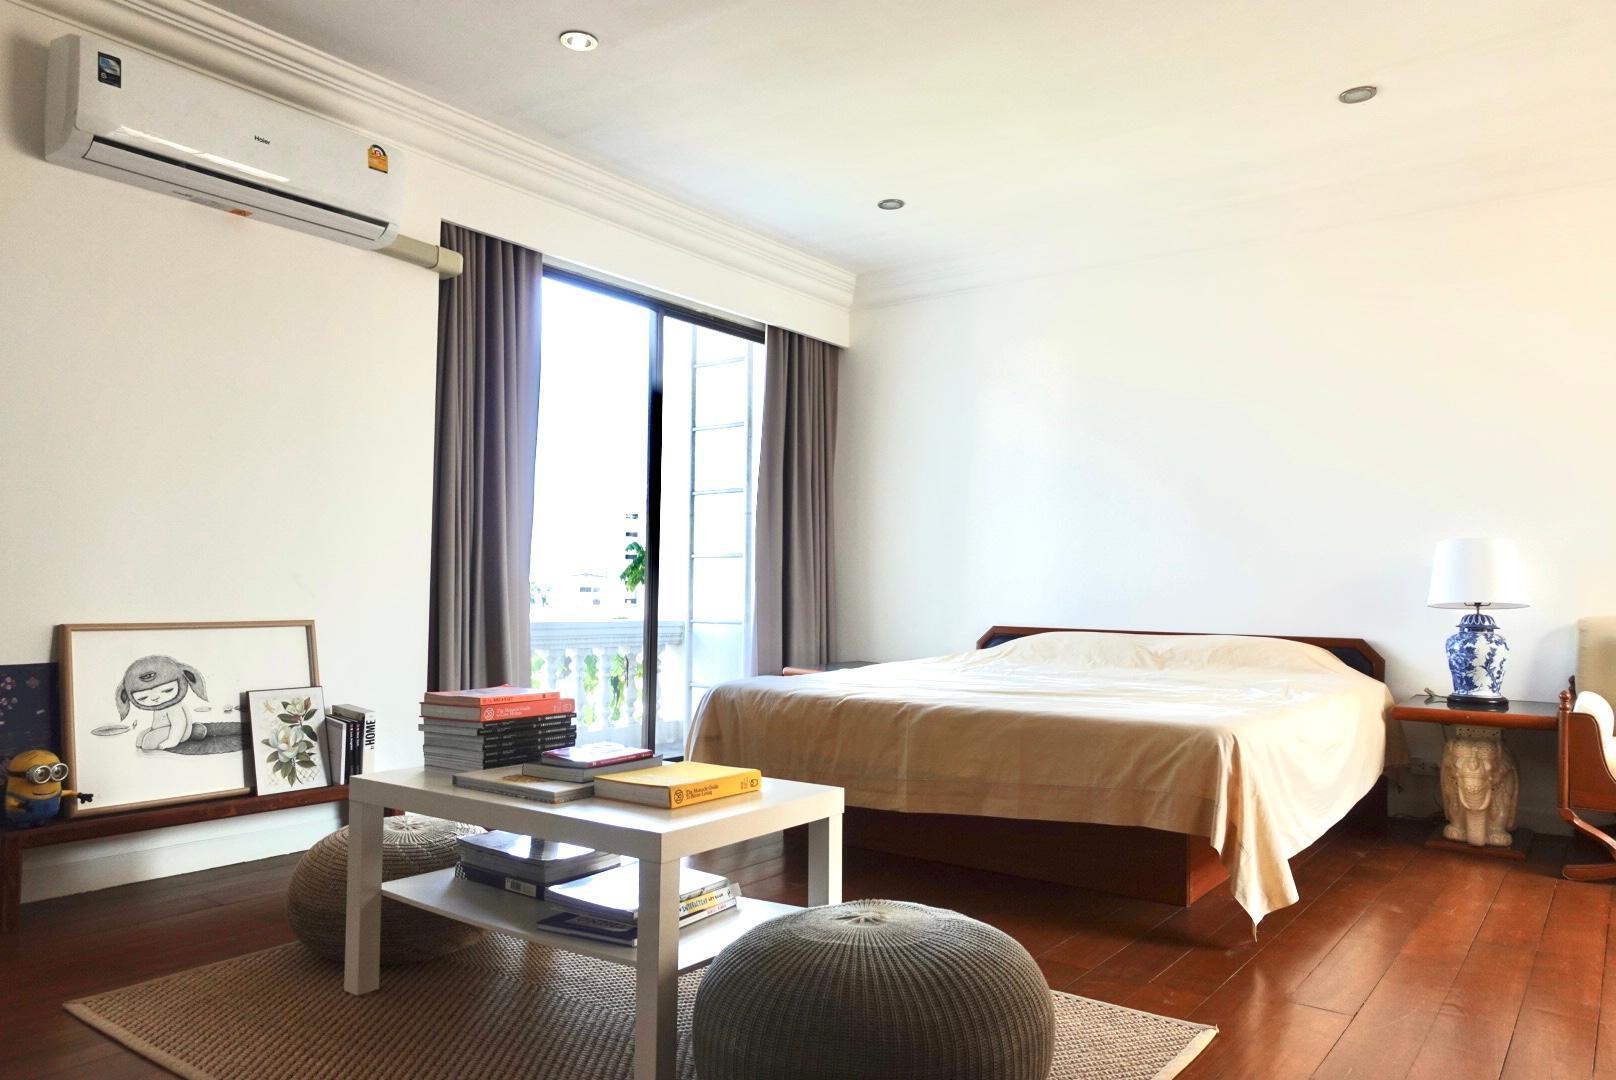 1 Bedroom In Sukhumvit Bangkok 2F Is Design Studio